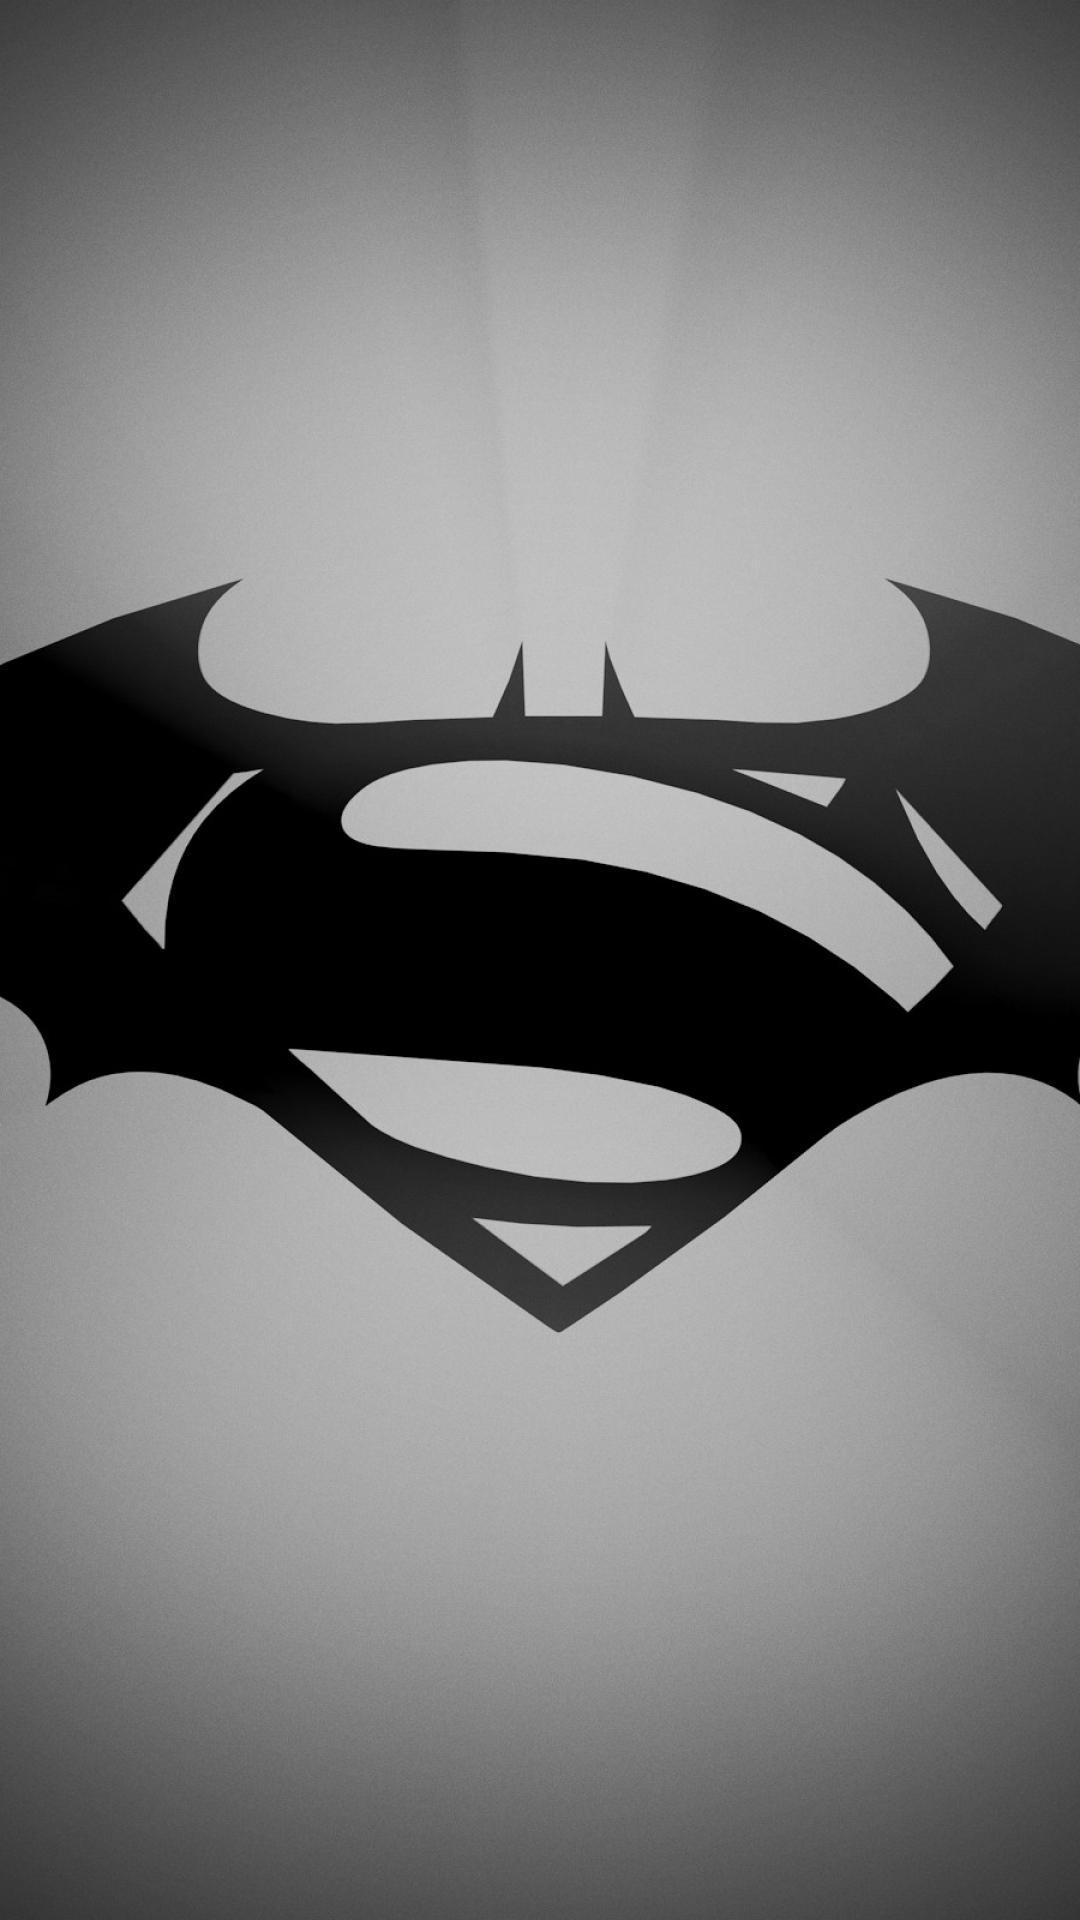 Batman Logo Wallpapers For Mobile Download